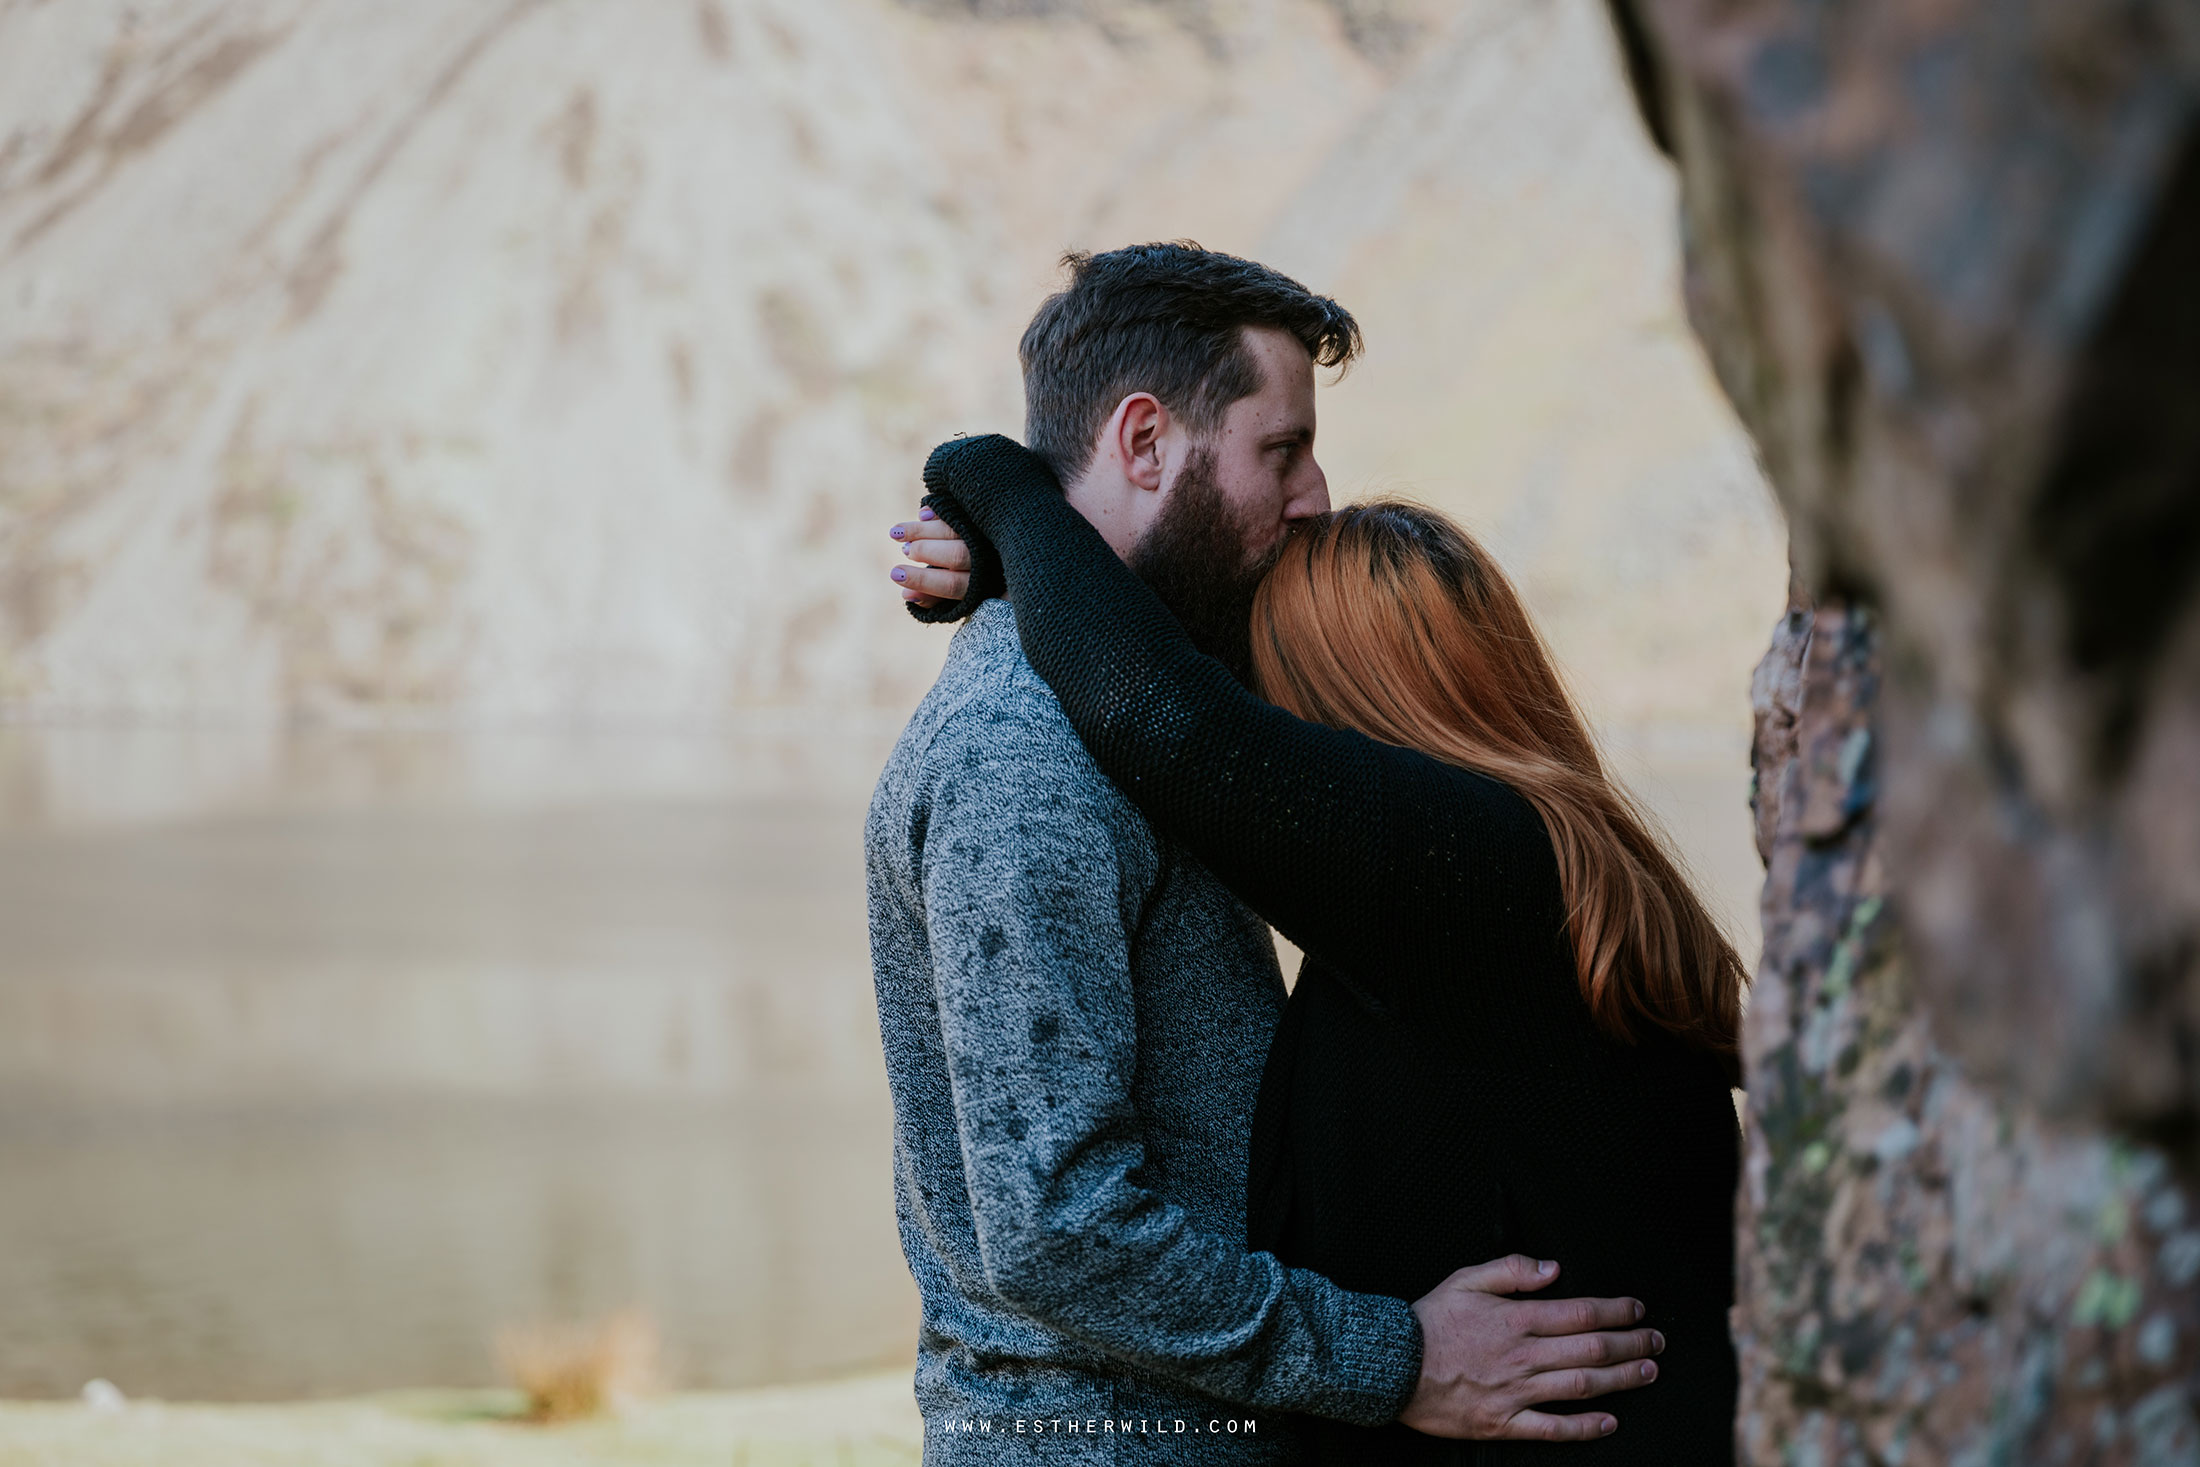 Cumbria_Lake_District_Wasdale_Wedding_Photographer_Destination_Engagement_Anniversary_Esther_Wild_IMG_3525.jpg